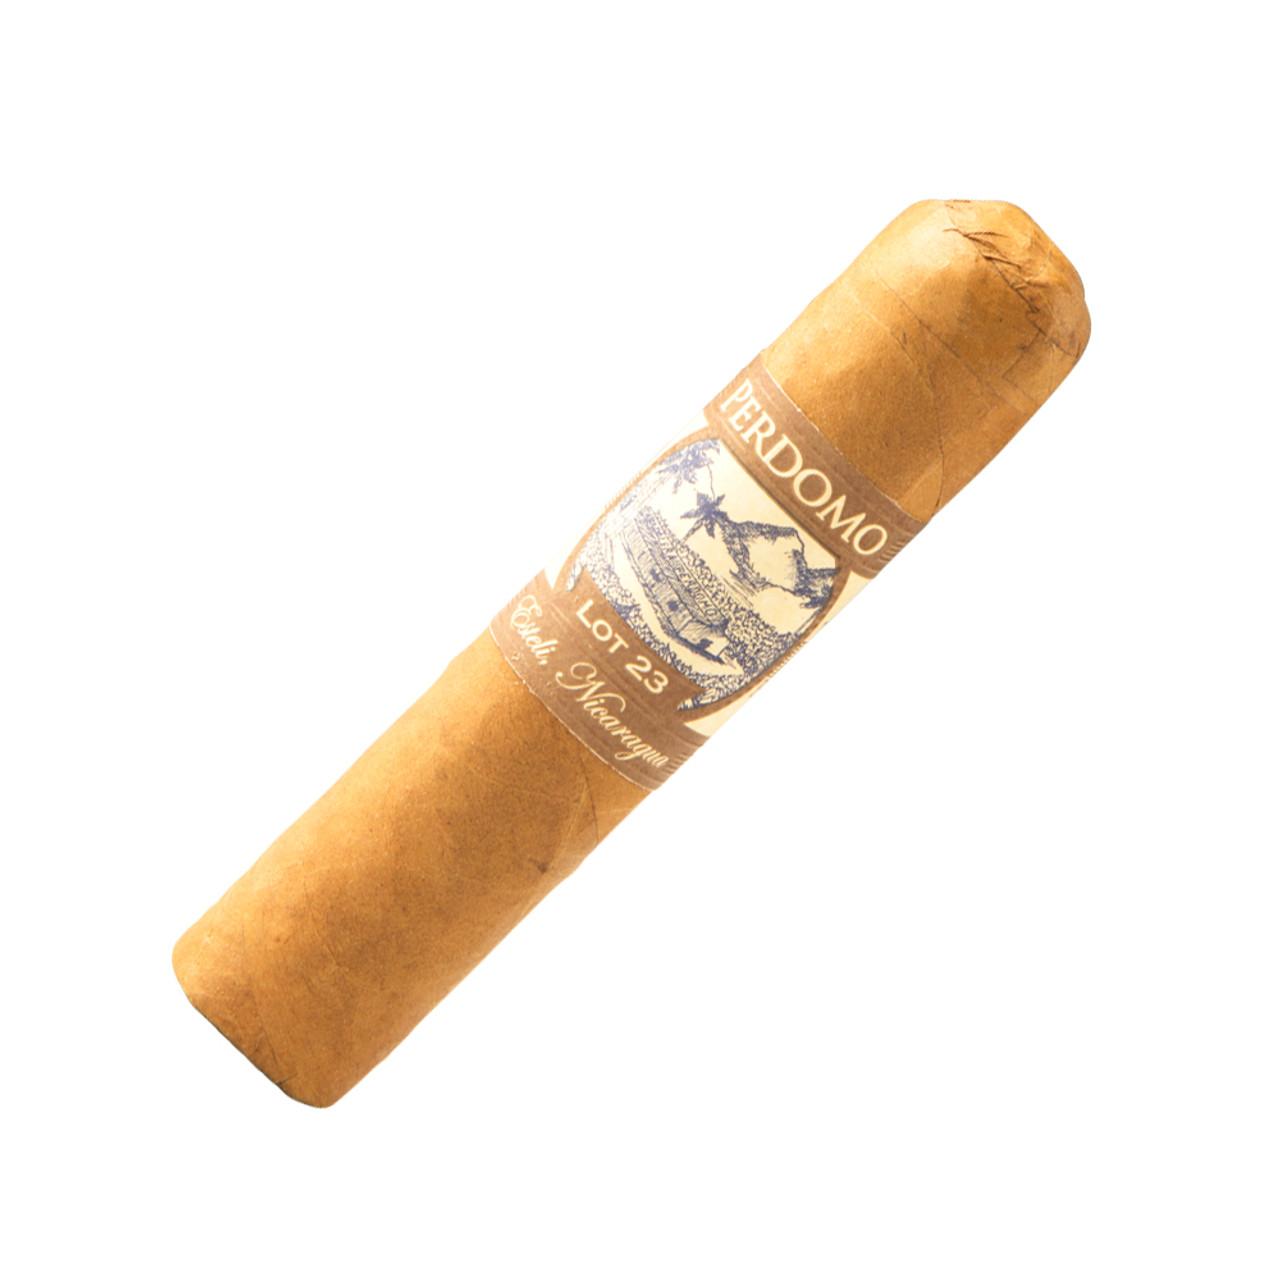 Perdomo Lot 23 Gordito Connecticut Cigars - 4.5 x 60 (Box of 24)